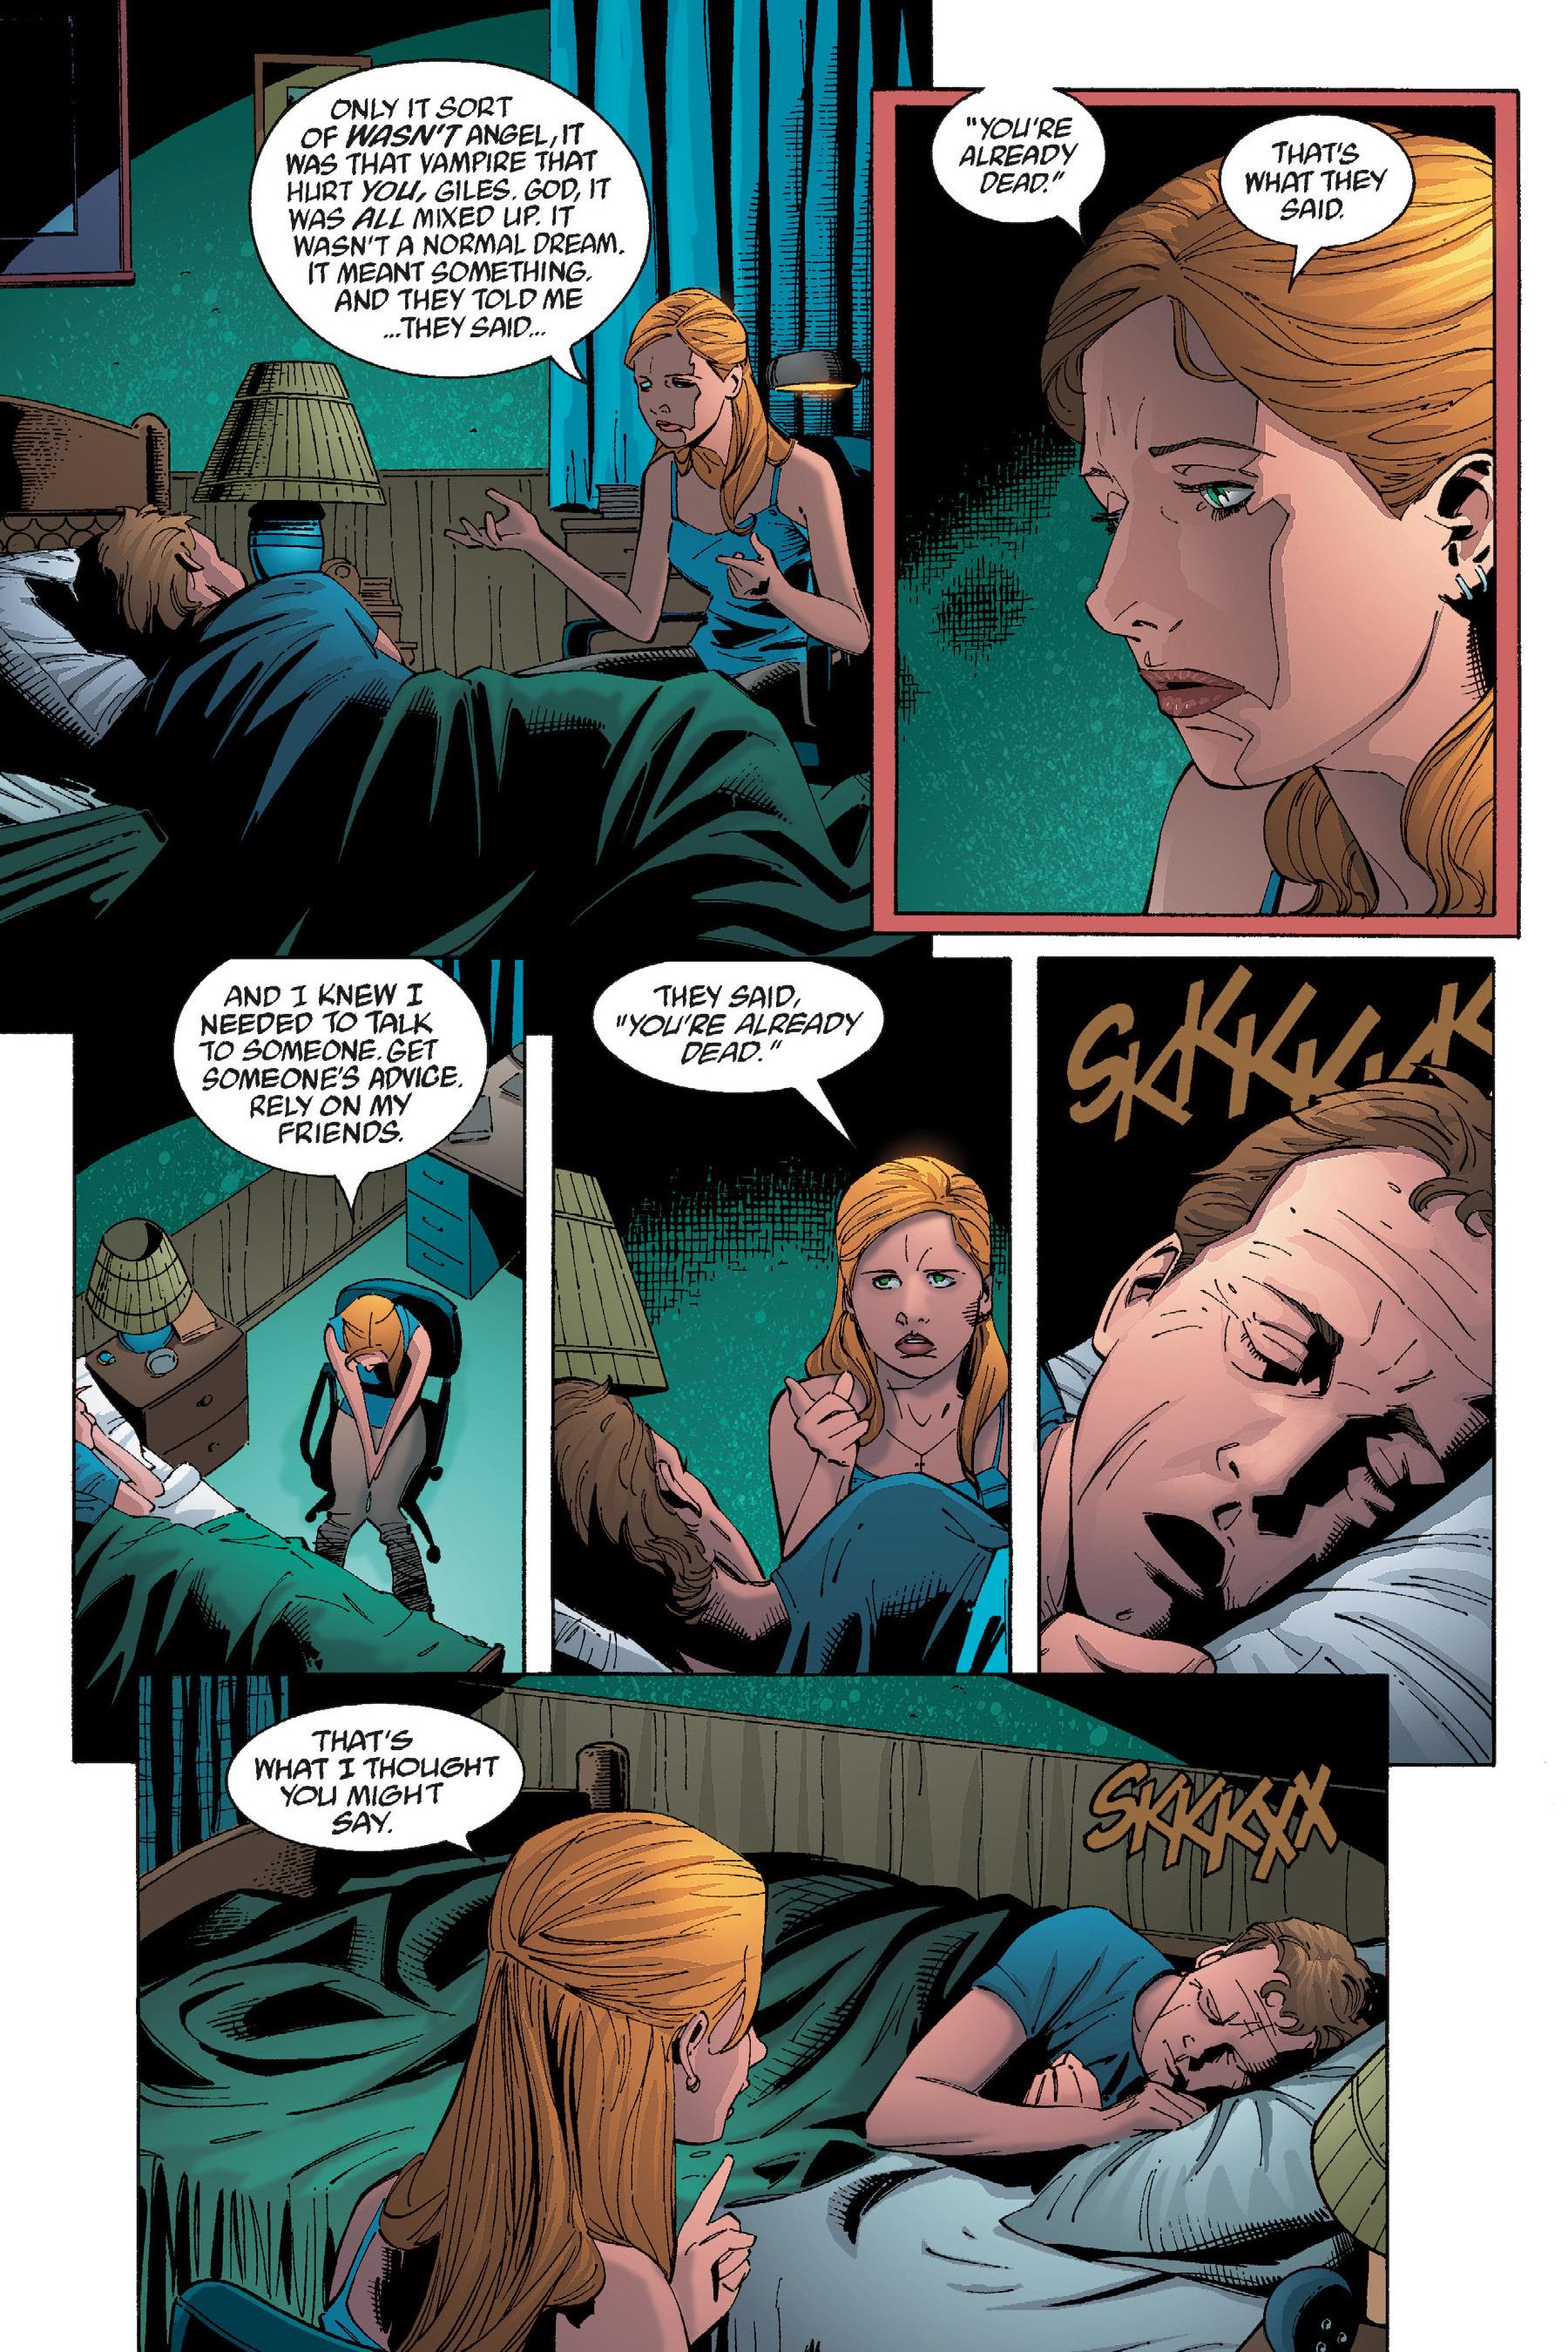 Read online Buffy the Vampire Slayer: Omnibus comic -  Issue # TPB 5 - 55